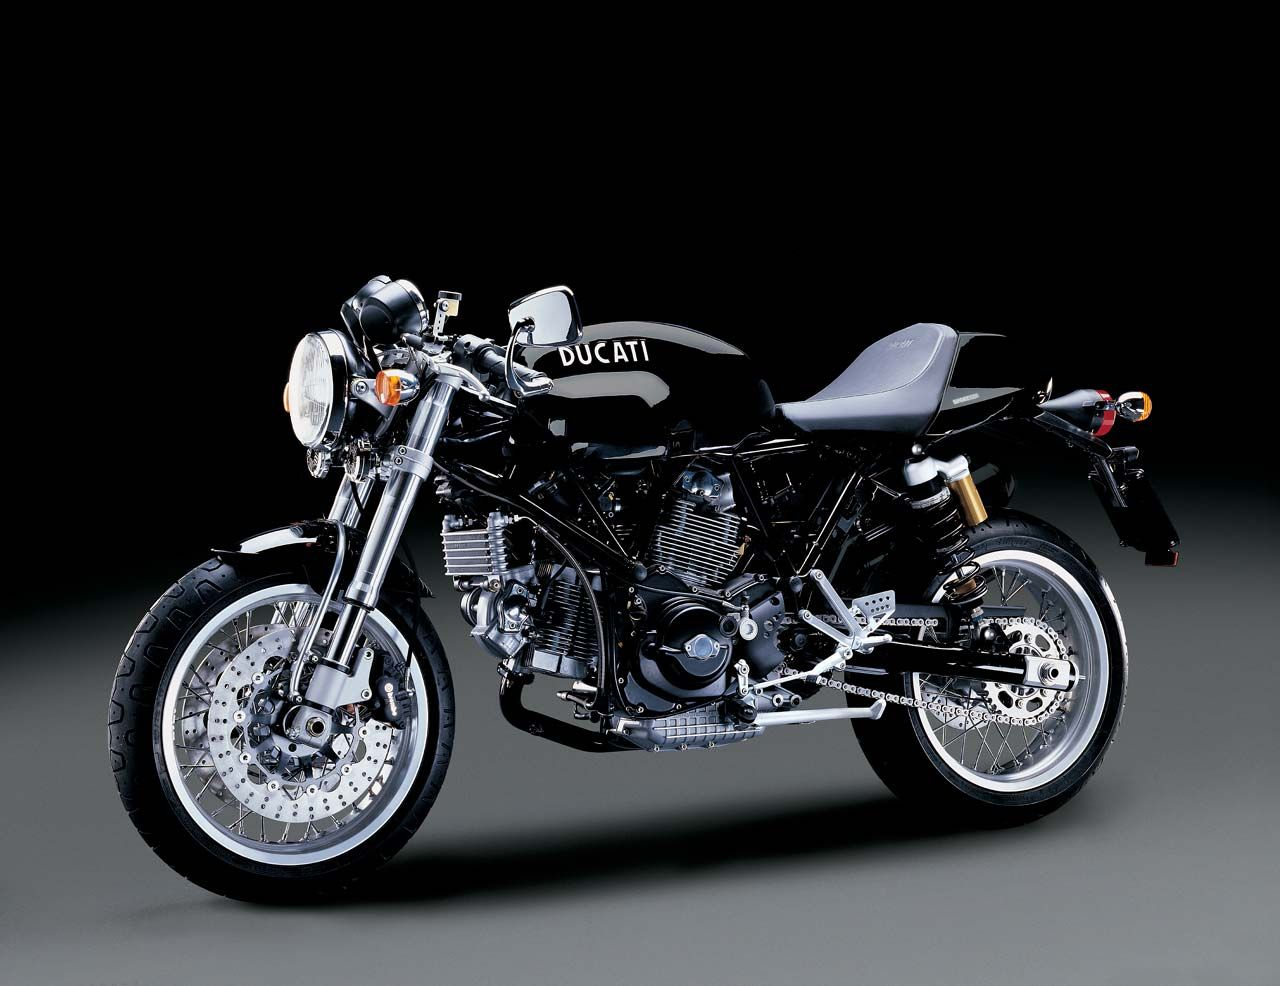 Ducati Sport 1000 Jpg 1 280 986 ???? Akio Pinterest